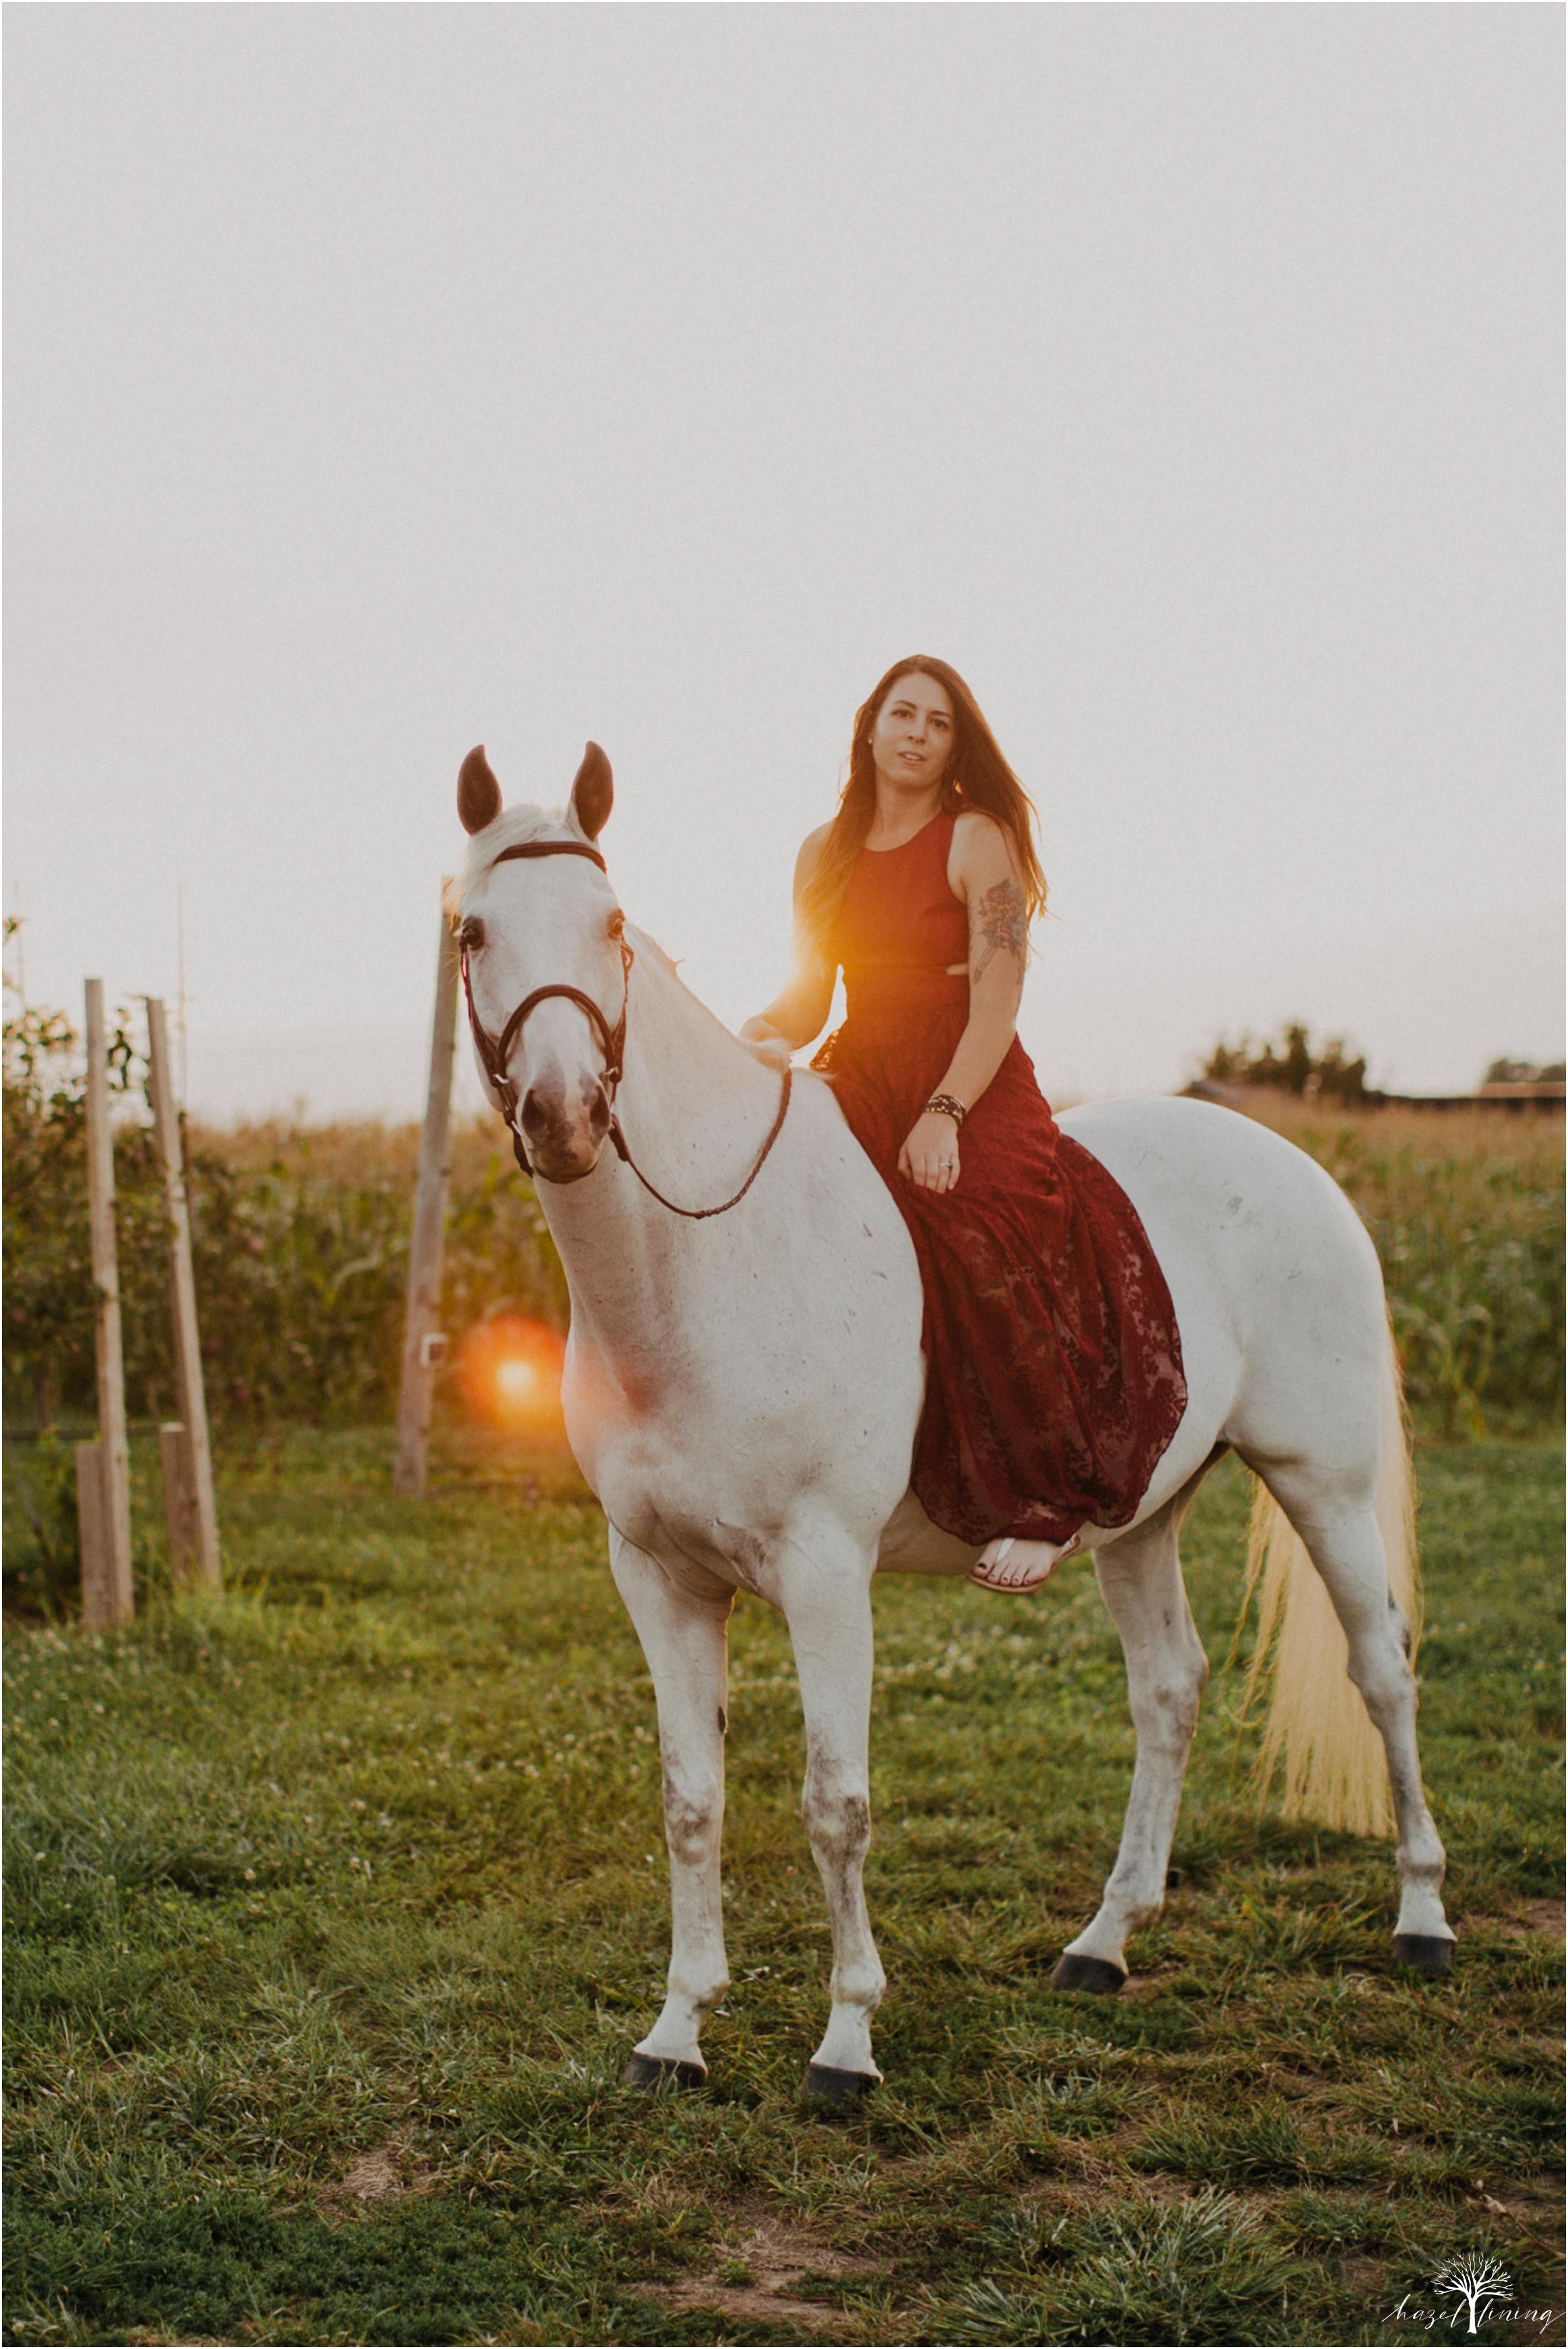 taylor-adams-and-horse-delaware-valley-university-delval-summer-equestrian-portrait-session-hazel-lining-photography-destination-elopement-wedding-engagement-photography_0070.jpg